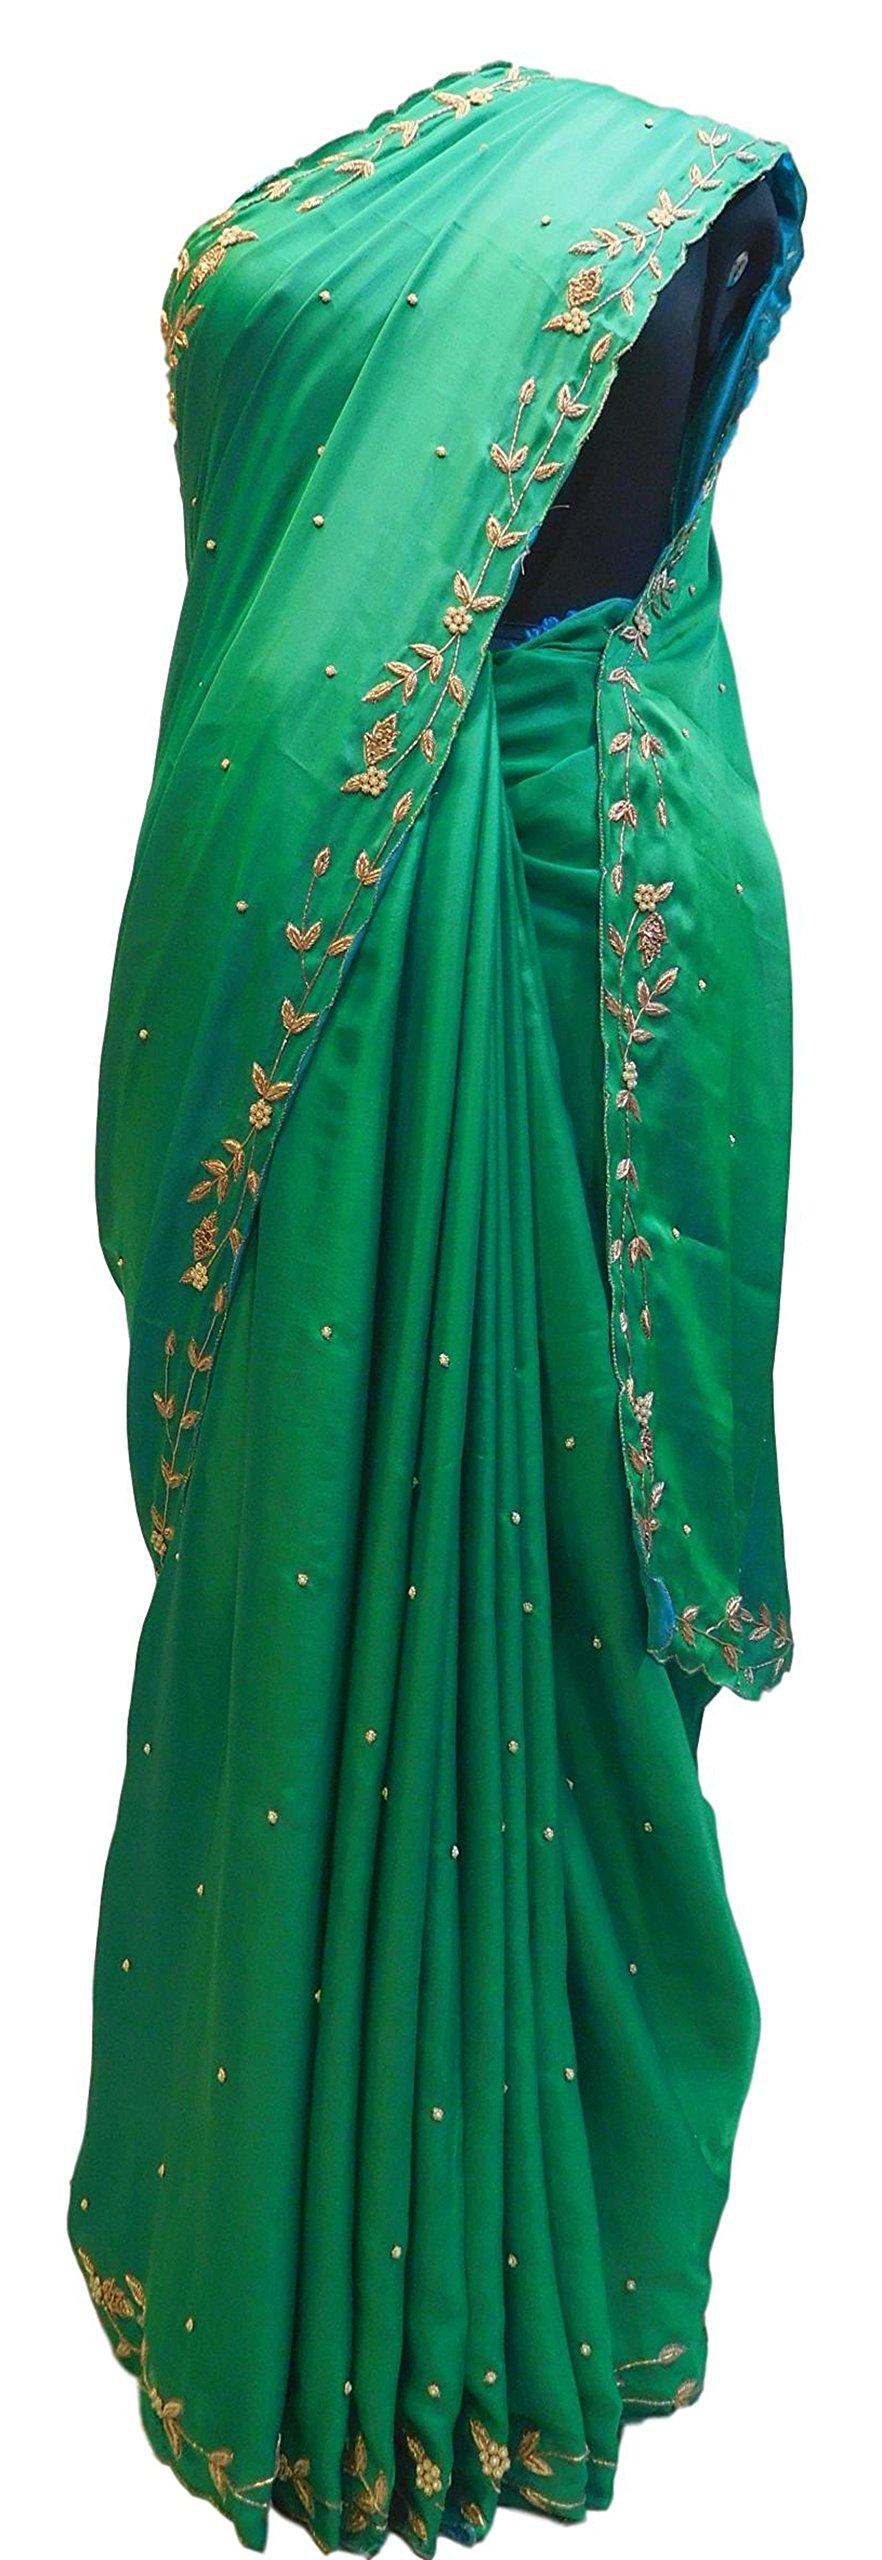 SMSAREE Green Designer Bridal PartyWear Silk Bullion Pearl Beads Stone Work Wedding Cutwork Border Saree Sari E017